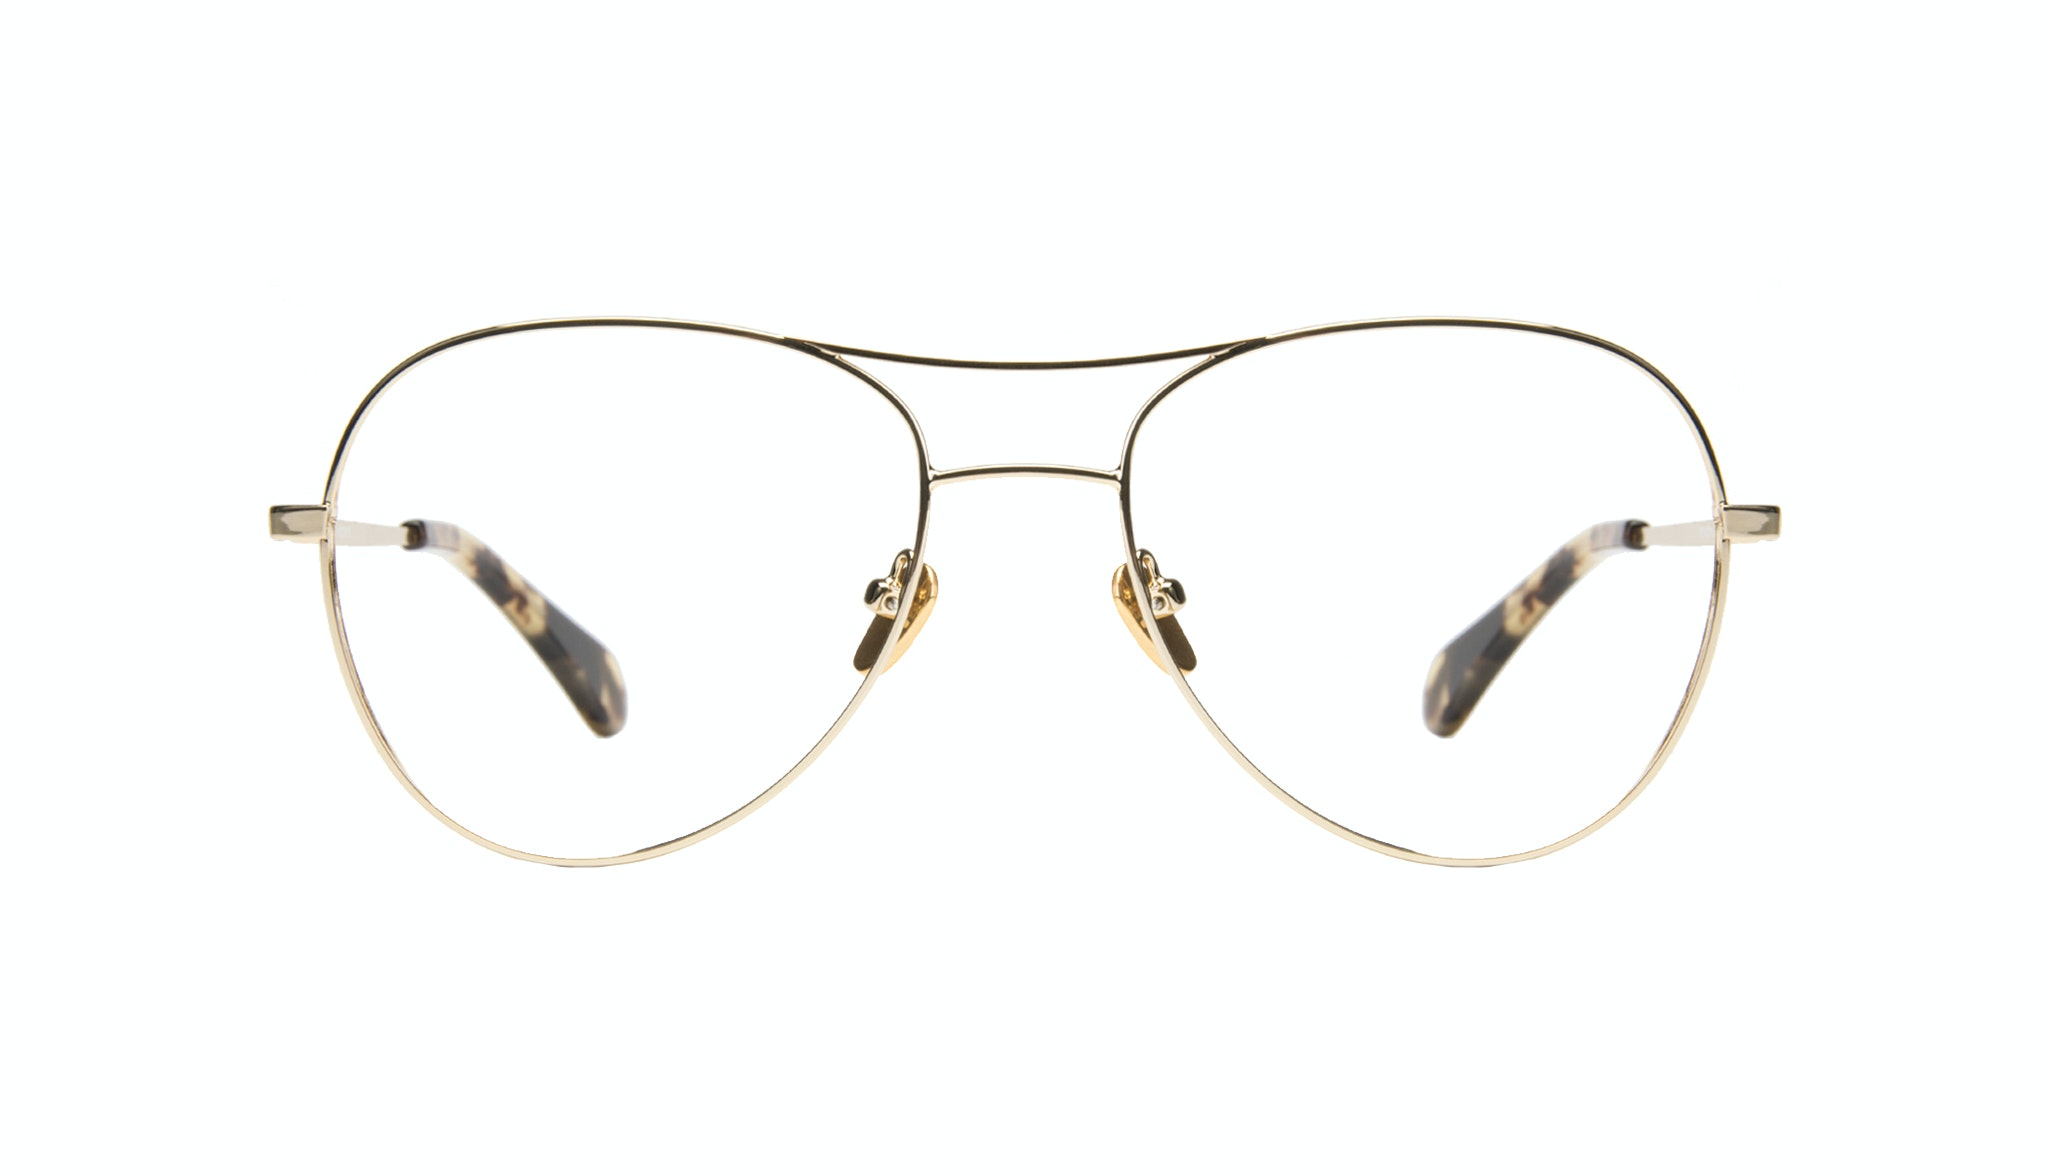 Affordable Fashion Glasses Aviator Eyeglasses Women Want Gold